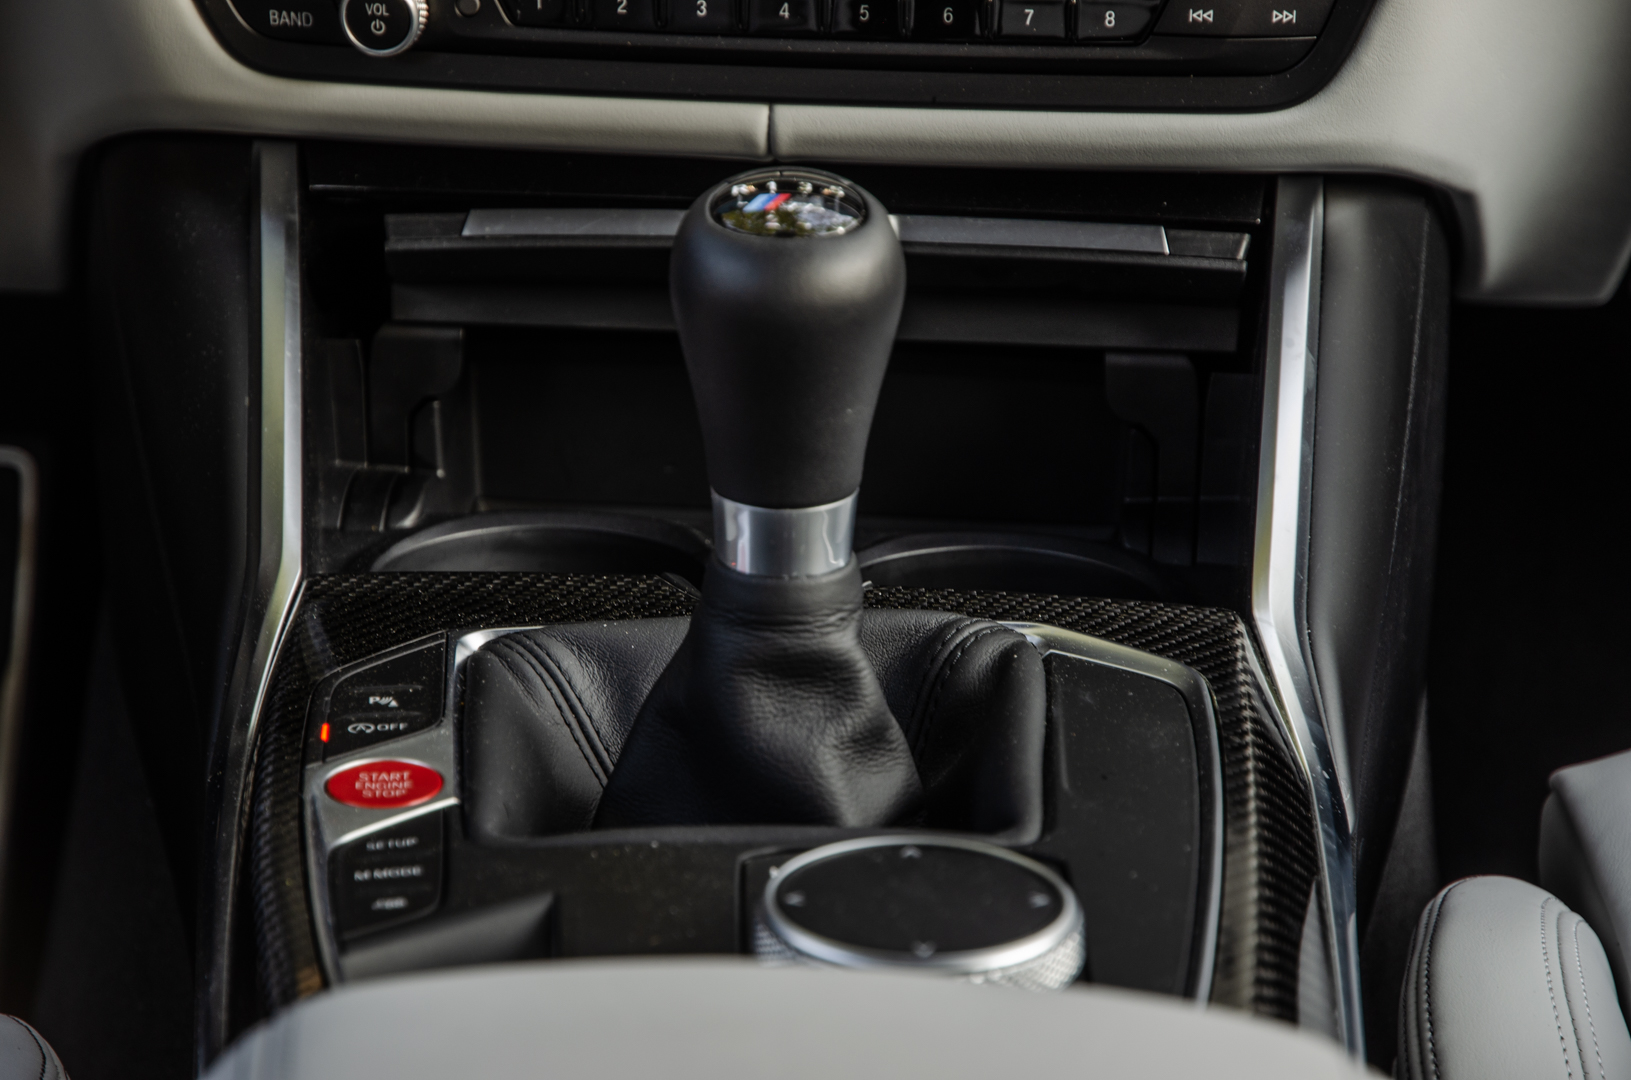 BMW M3 Manual Test Drive 34 of 37